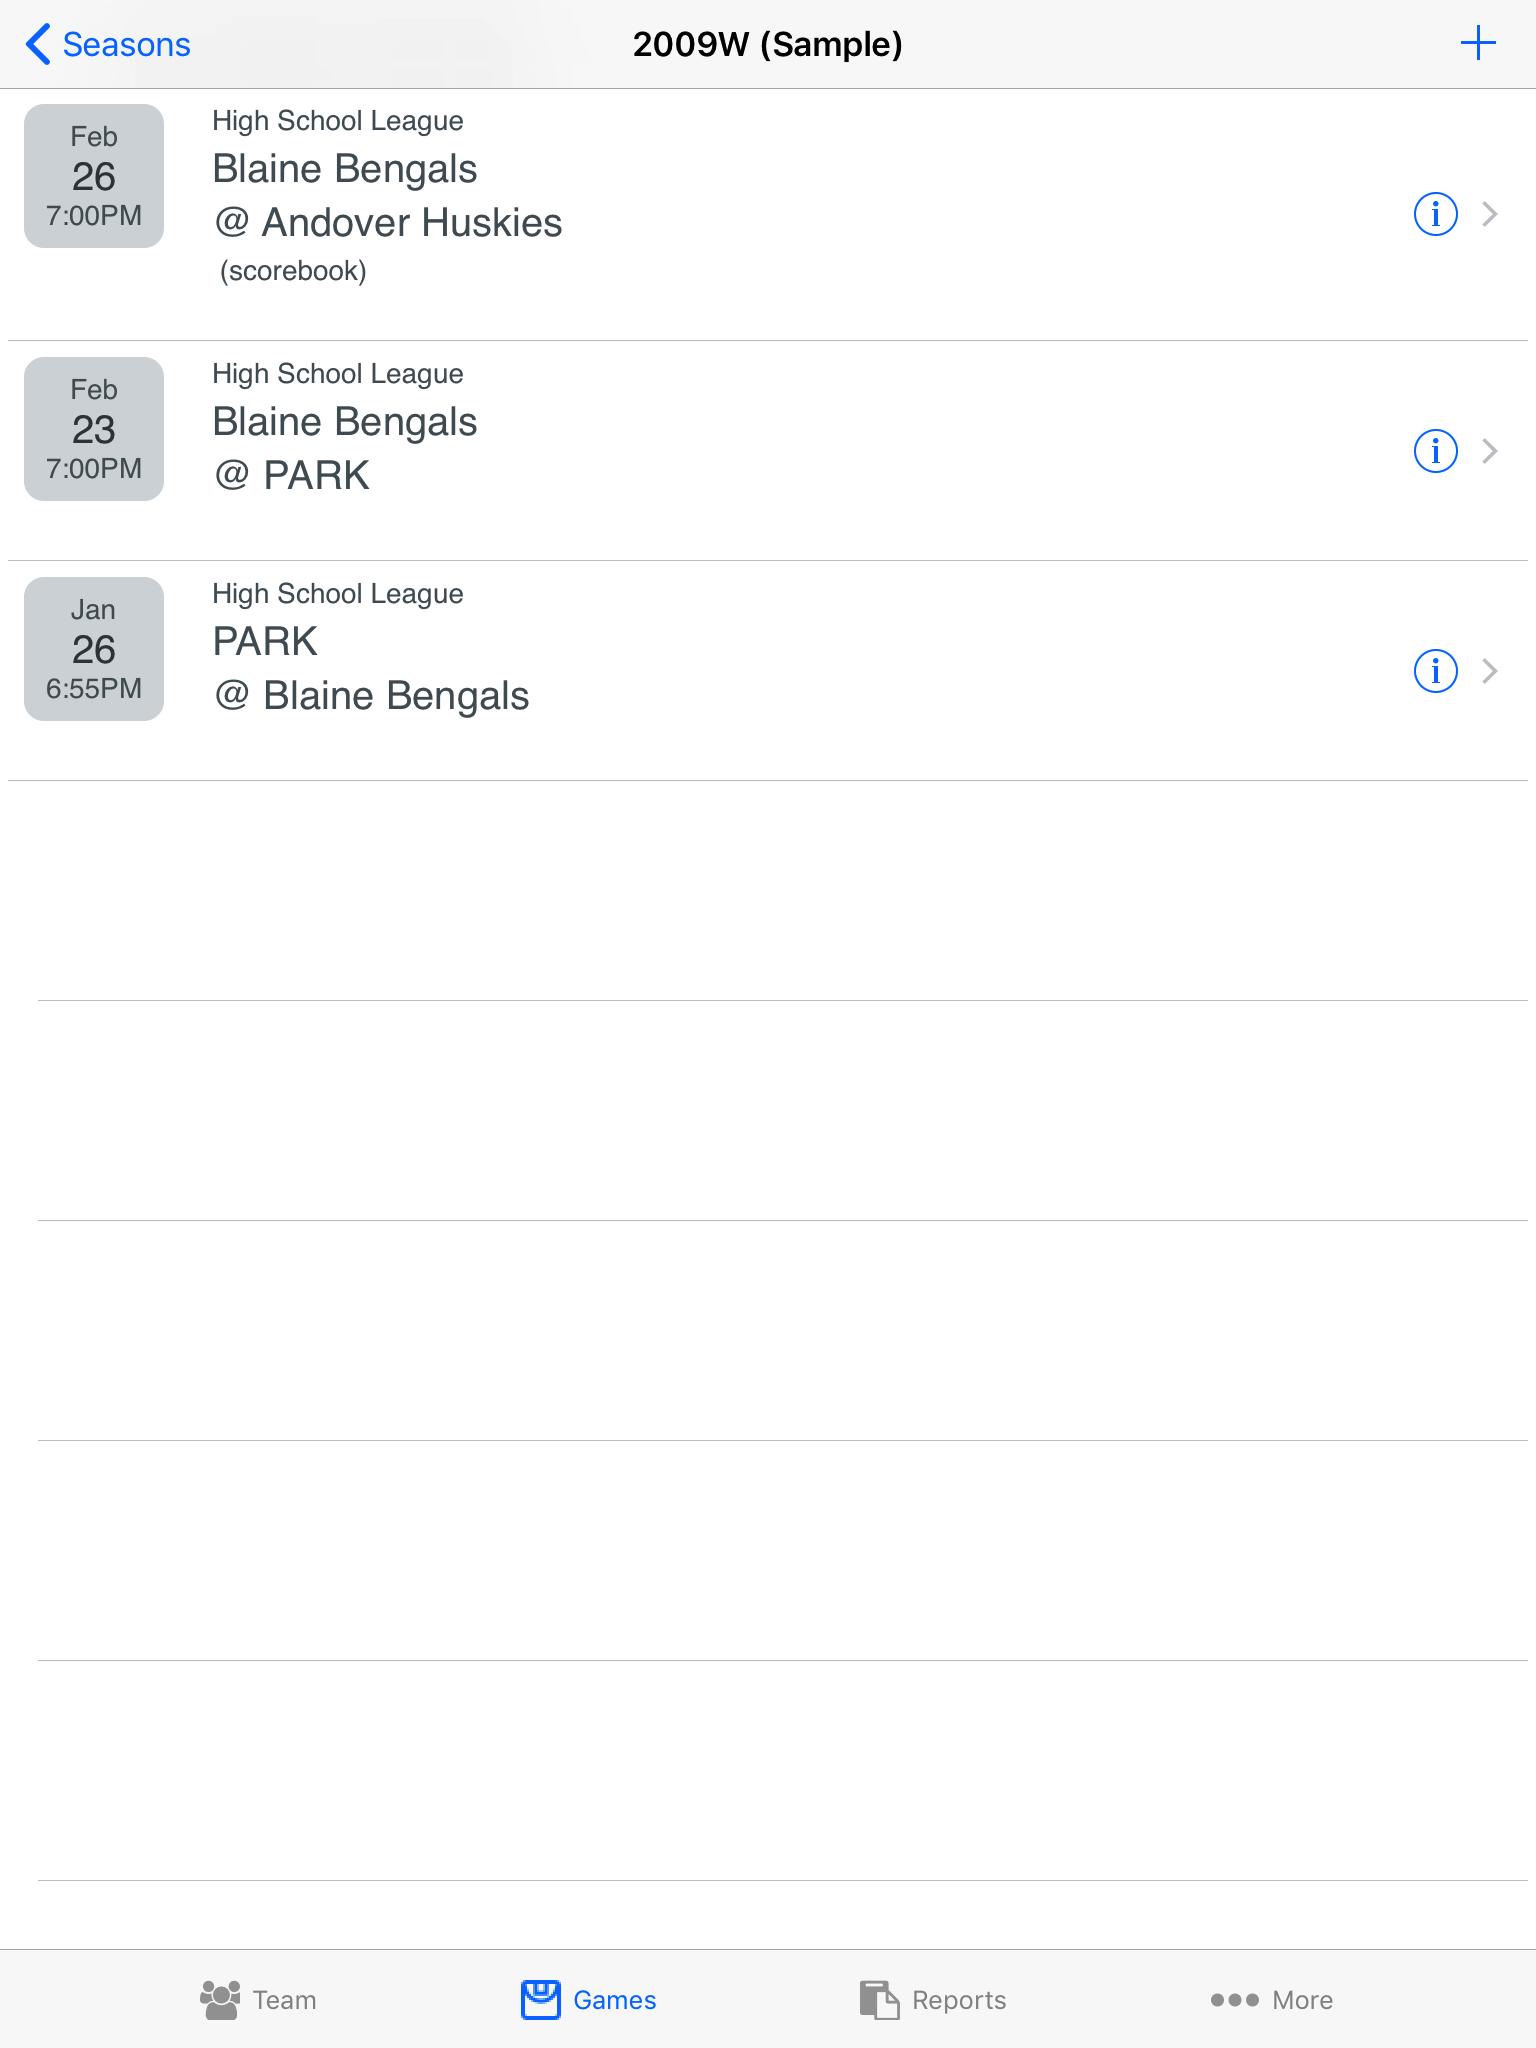 Simulator Screen Shot - iPad Air 2 - 2017-12-17 at 17.18.26.png